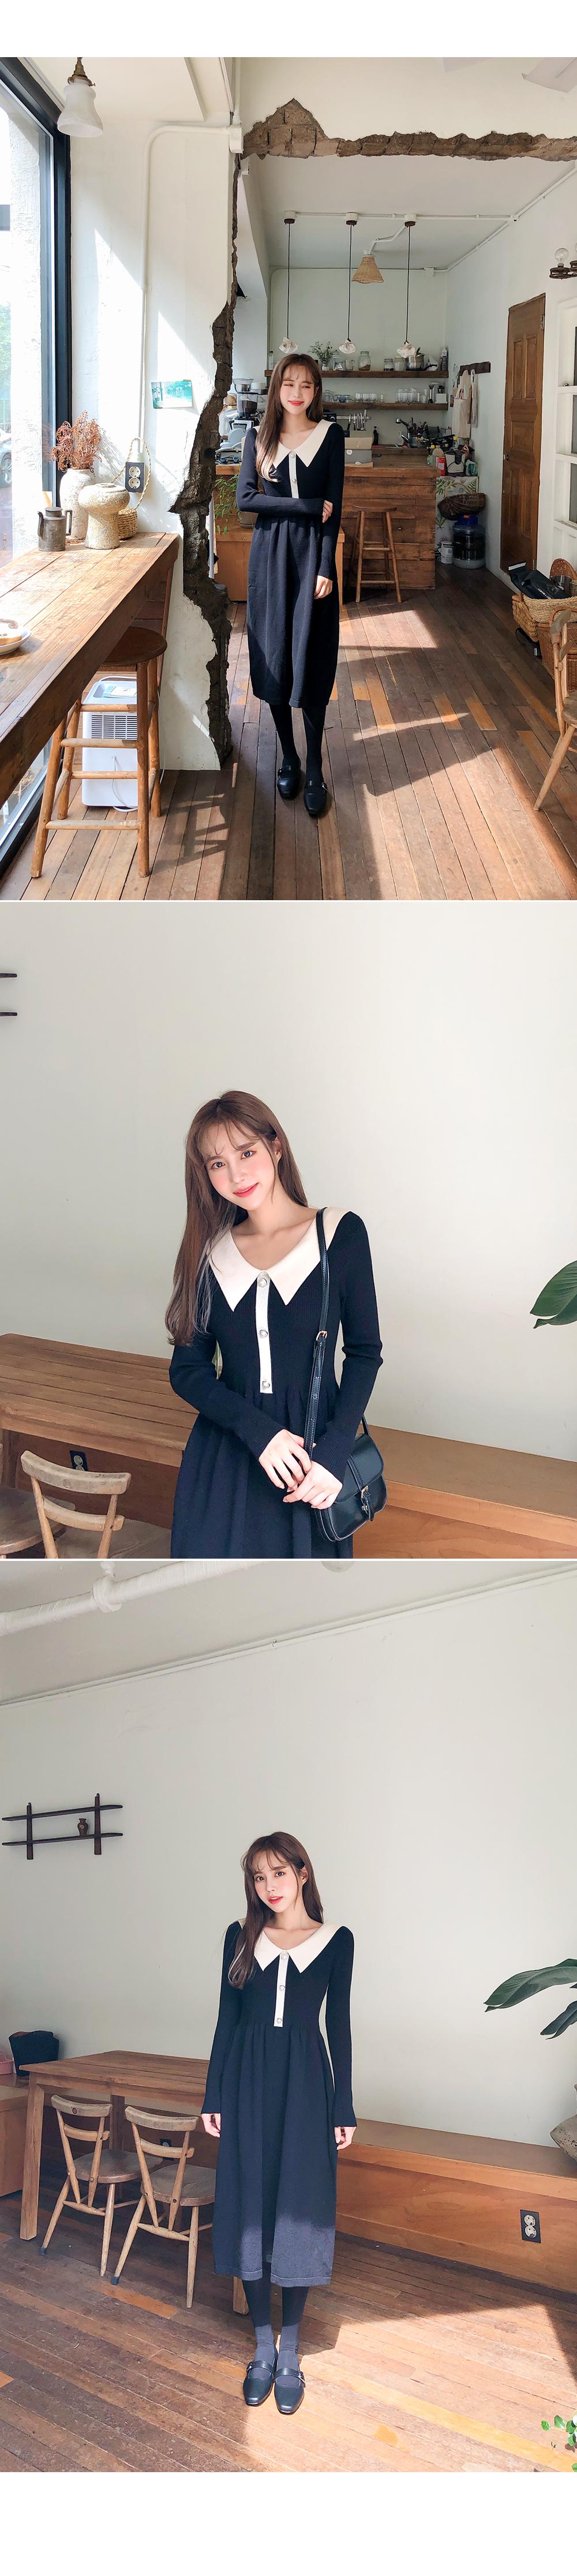 Jewelry knit collar dress